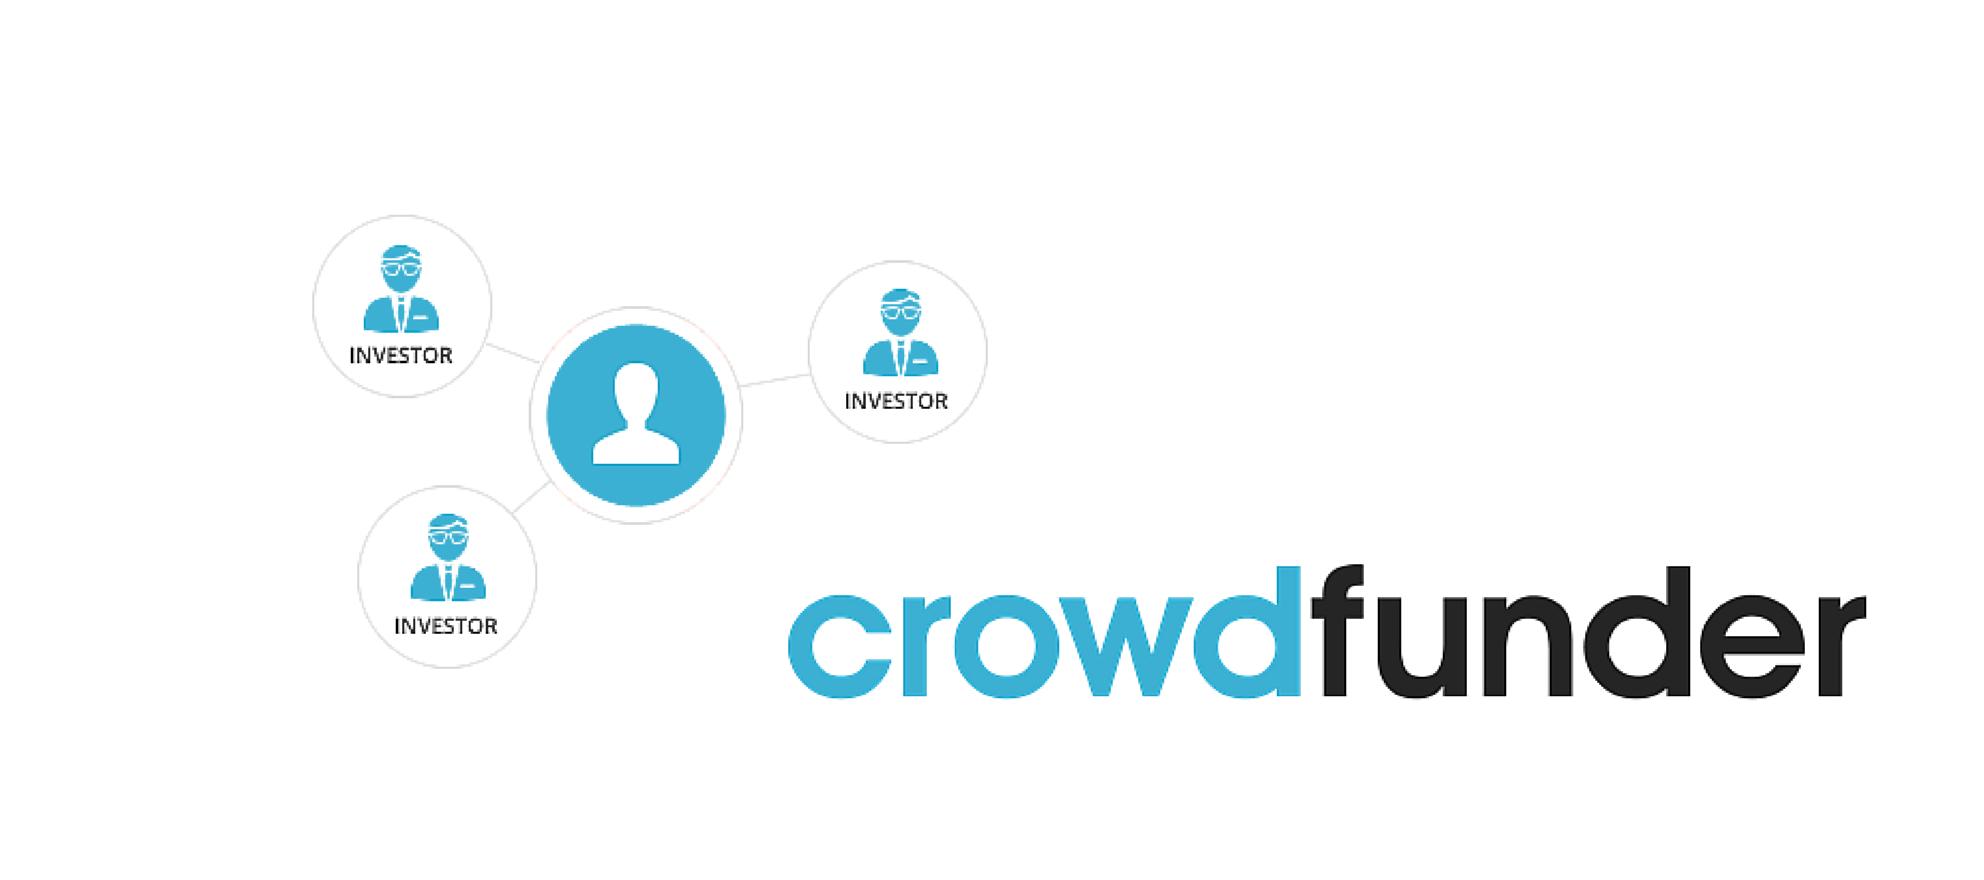 Real estate crowdfunder seeking to crowdfund itself